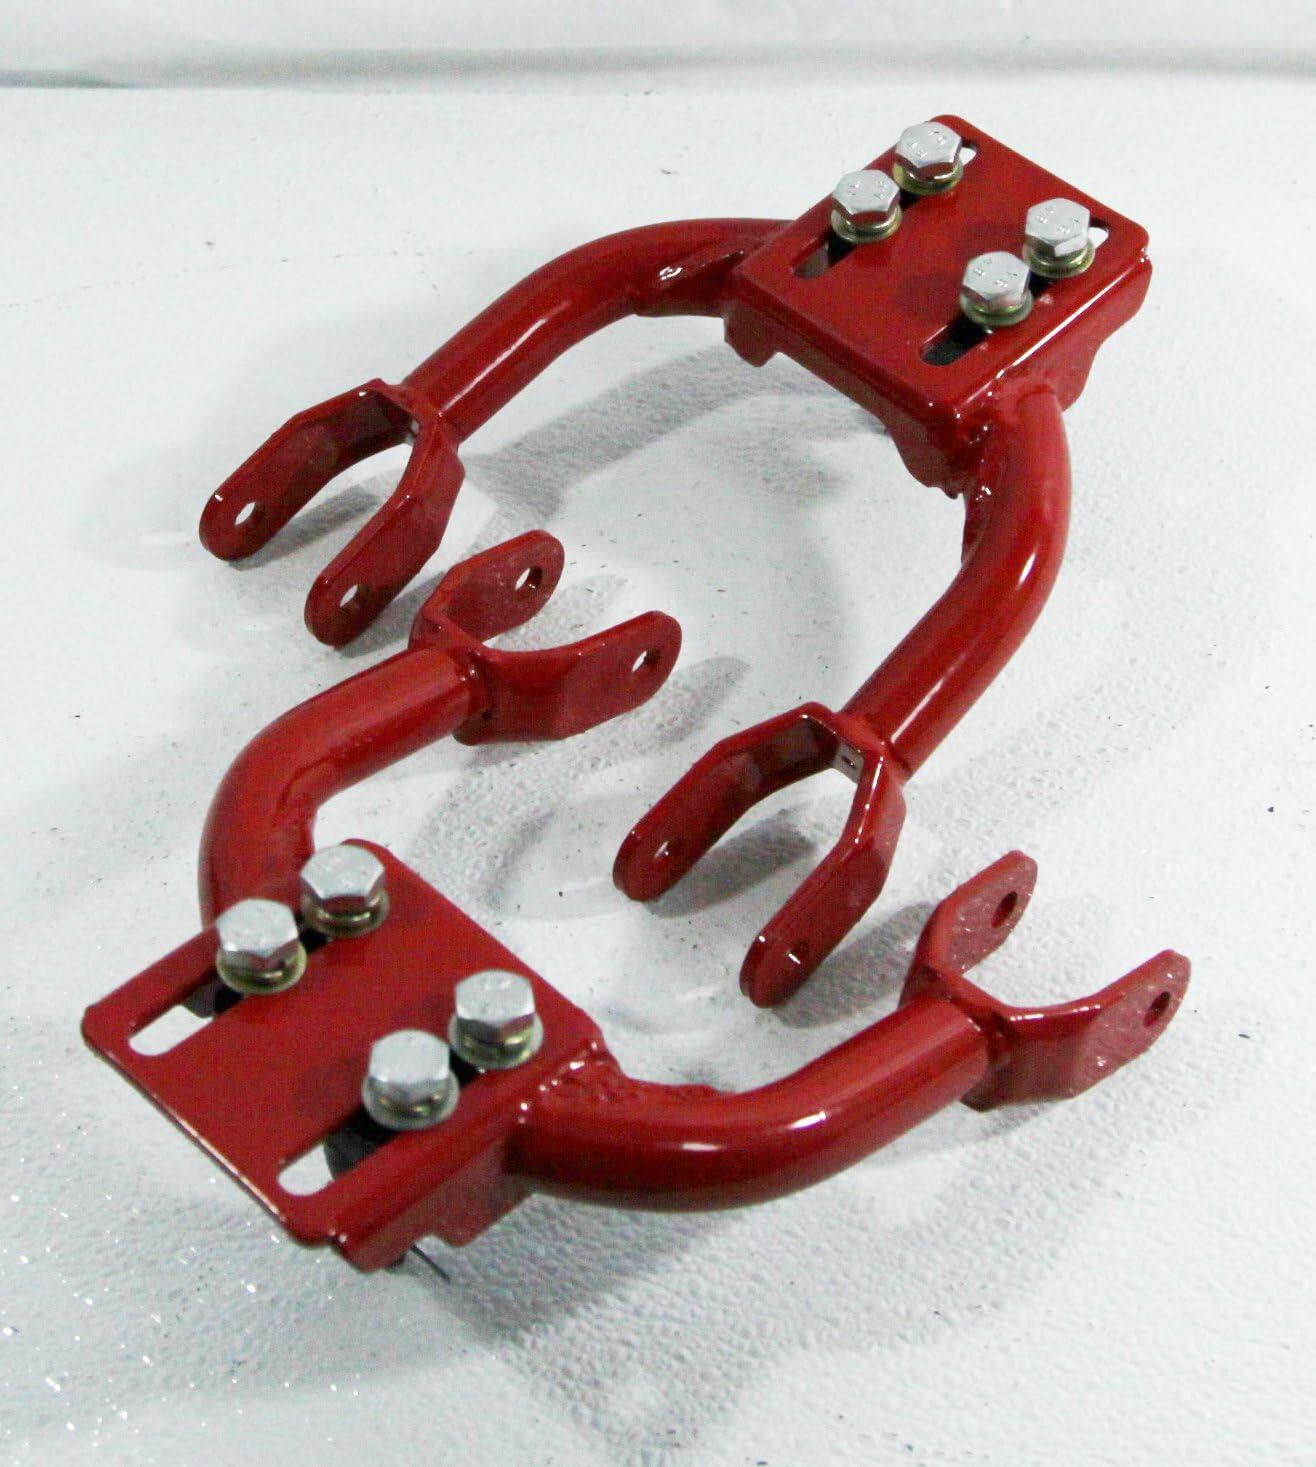 RED 1 PAIR Front Upper Tubular ADJ.Camber Arm for 1994-2001 Acura Integra// 1992-1995 Honda Civic// 1993-1997 Honda Civic del Sol